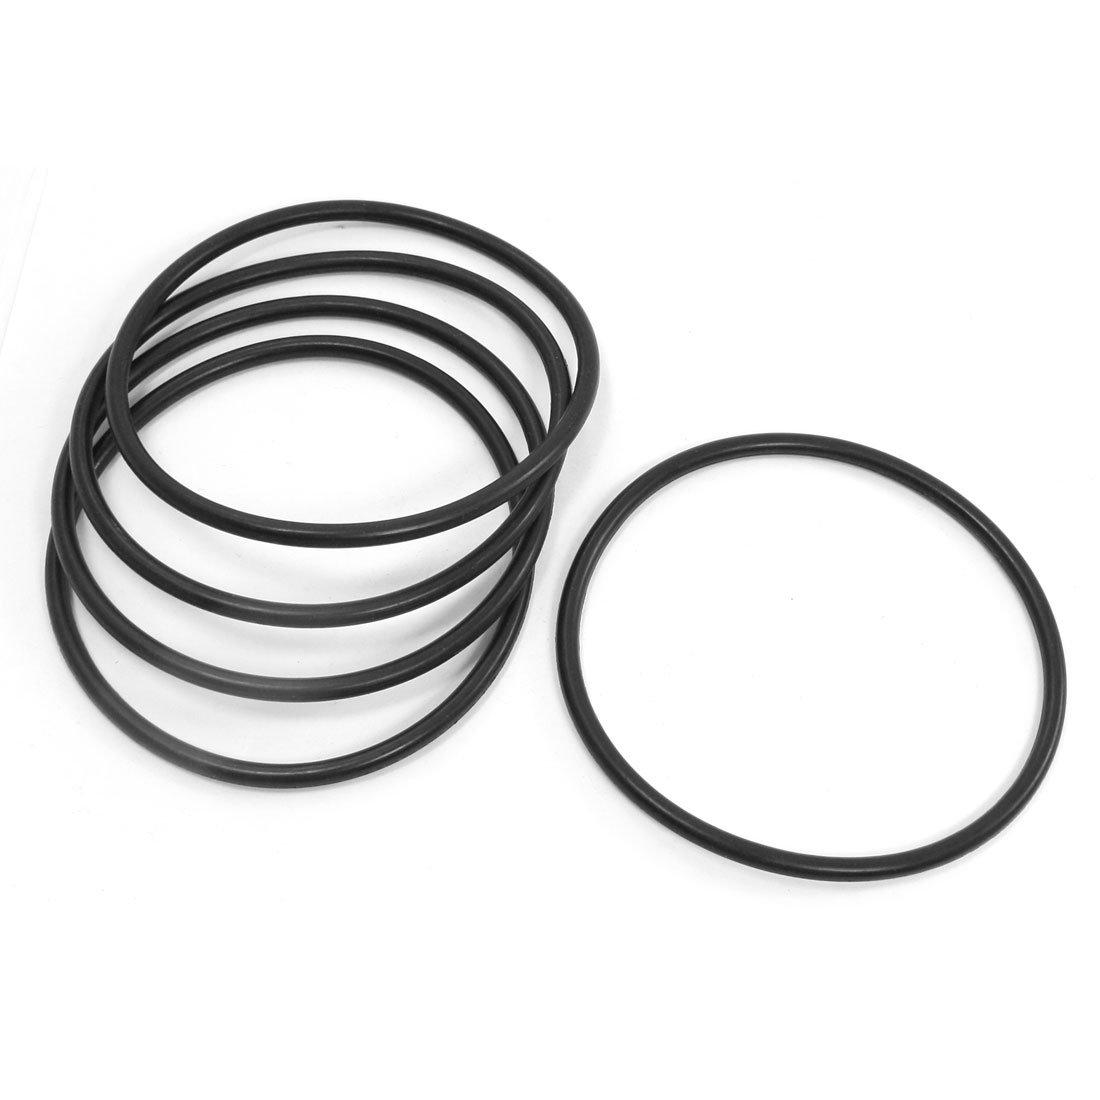 5x Ö ldichtungsring/O-Ring aus Gummi, 105 x 5 mm. Sourcingmap a14022100ux0236